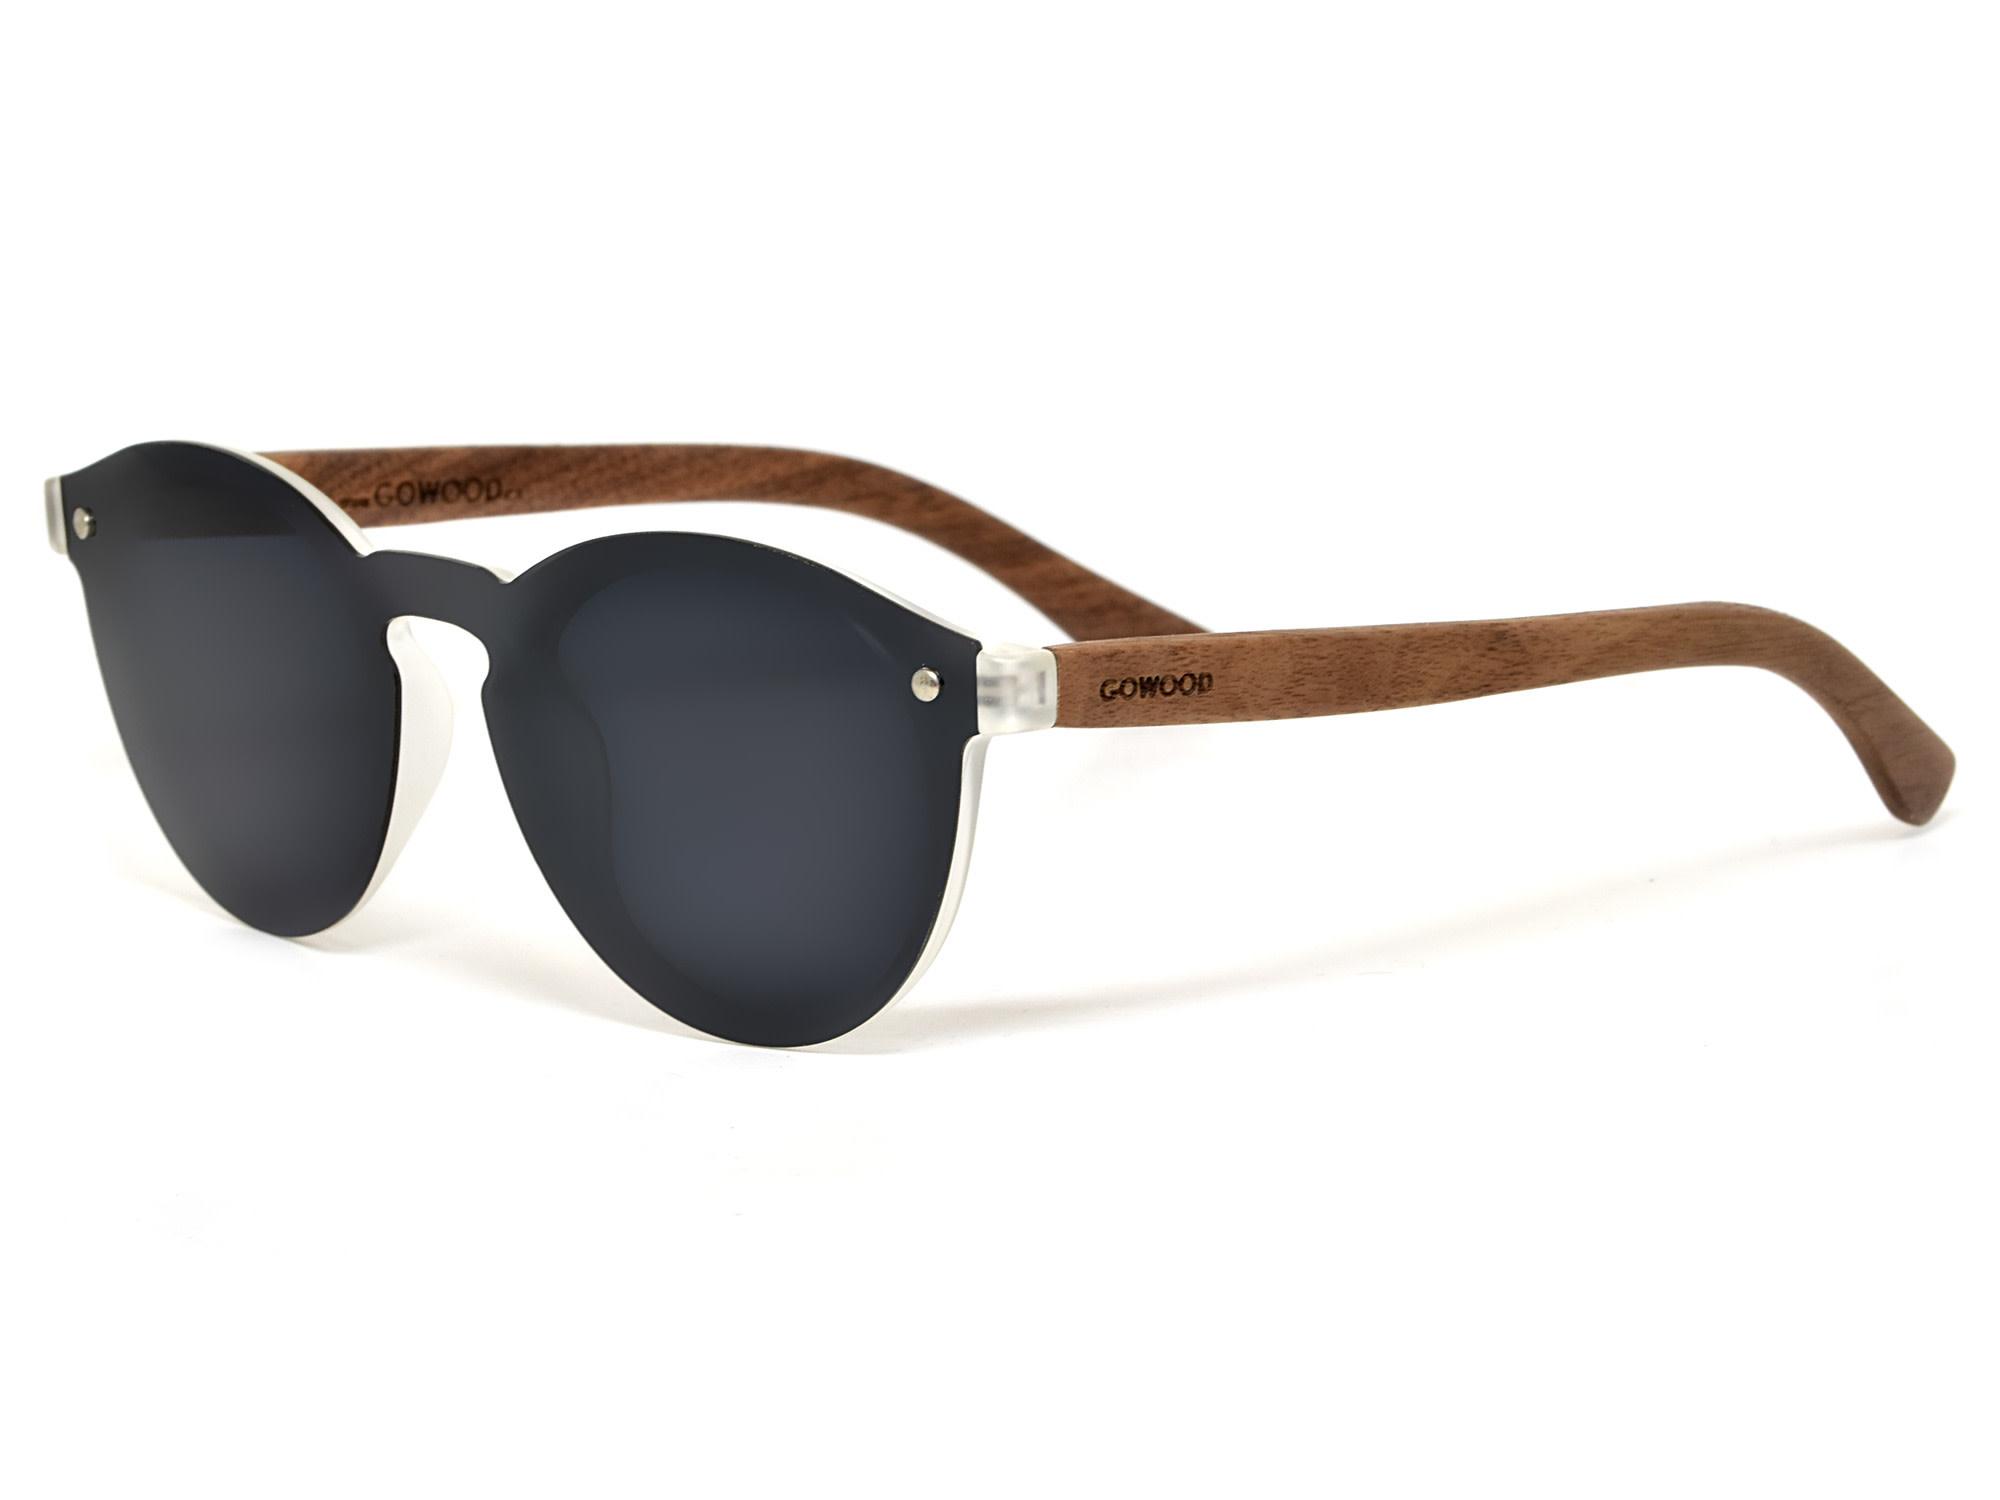 GoWood Sunglasses: Round Bamboo Wood  w/ Black Polarized Lenses RIO-B2-G